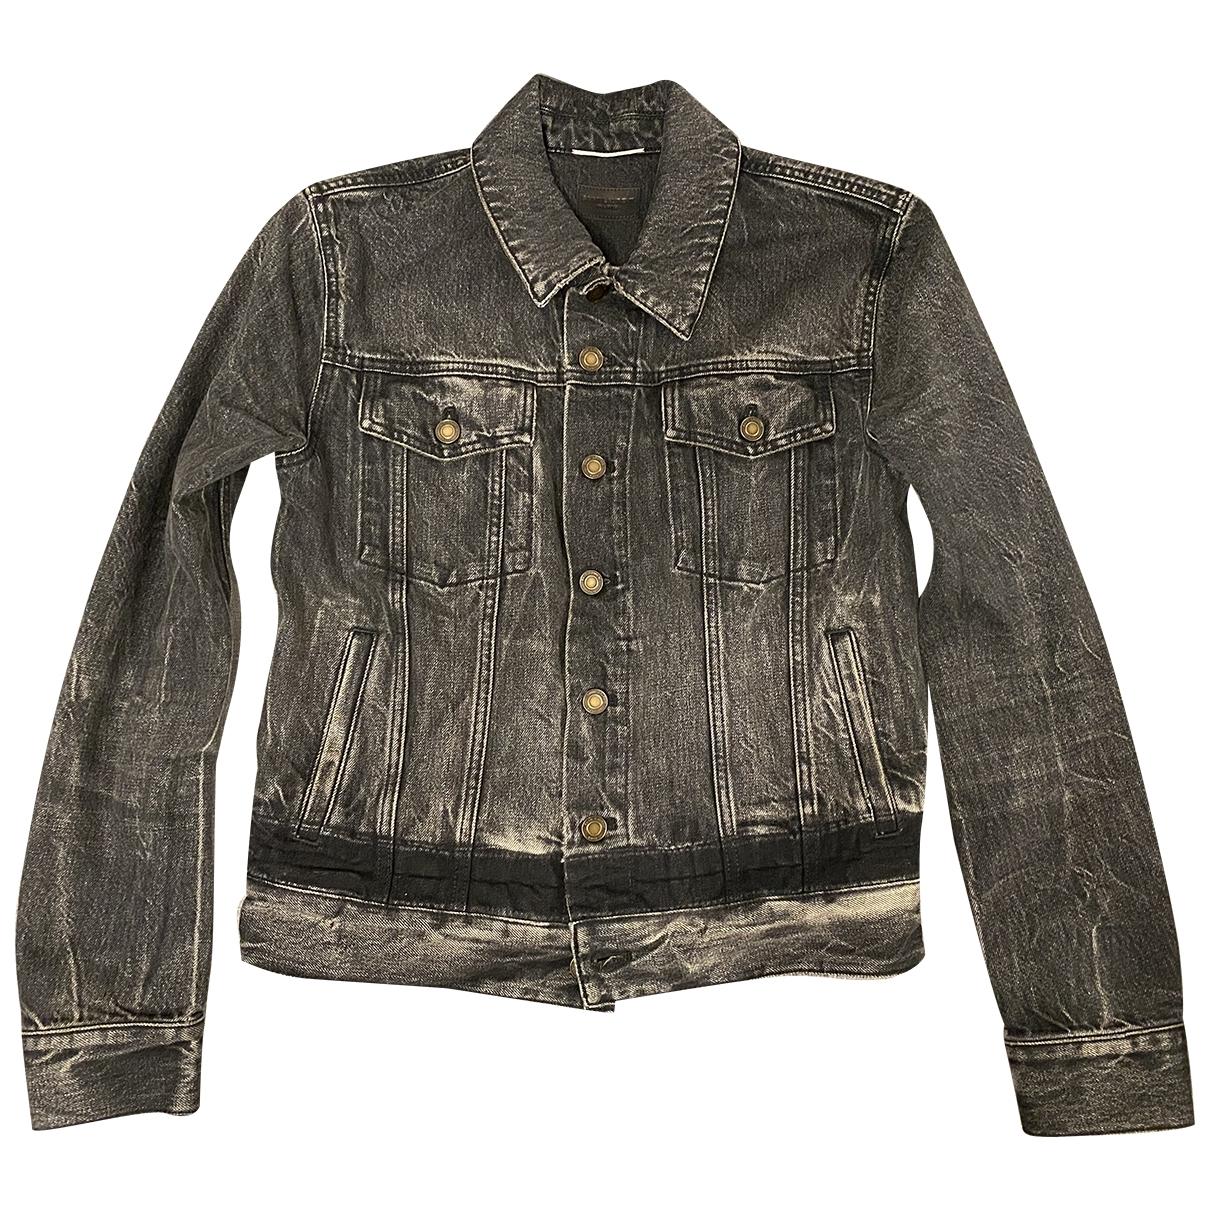 Saint Laurent \N Anthracite Denim - Jeans jacket  for Men XS International